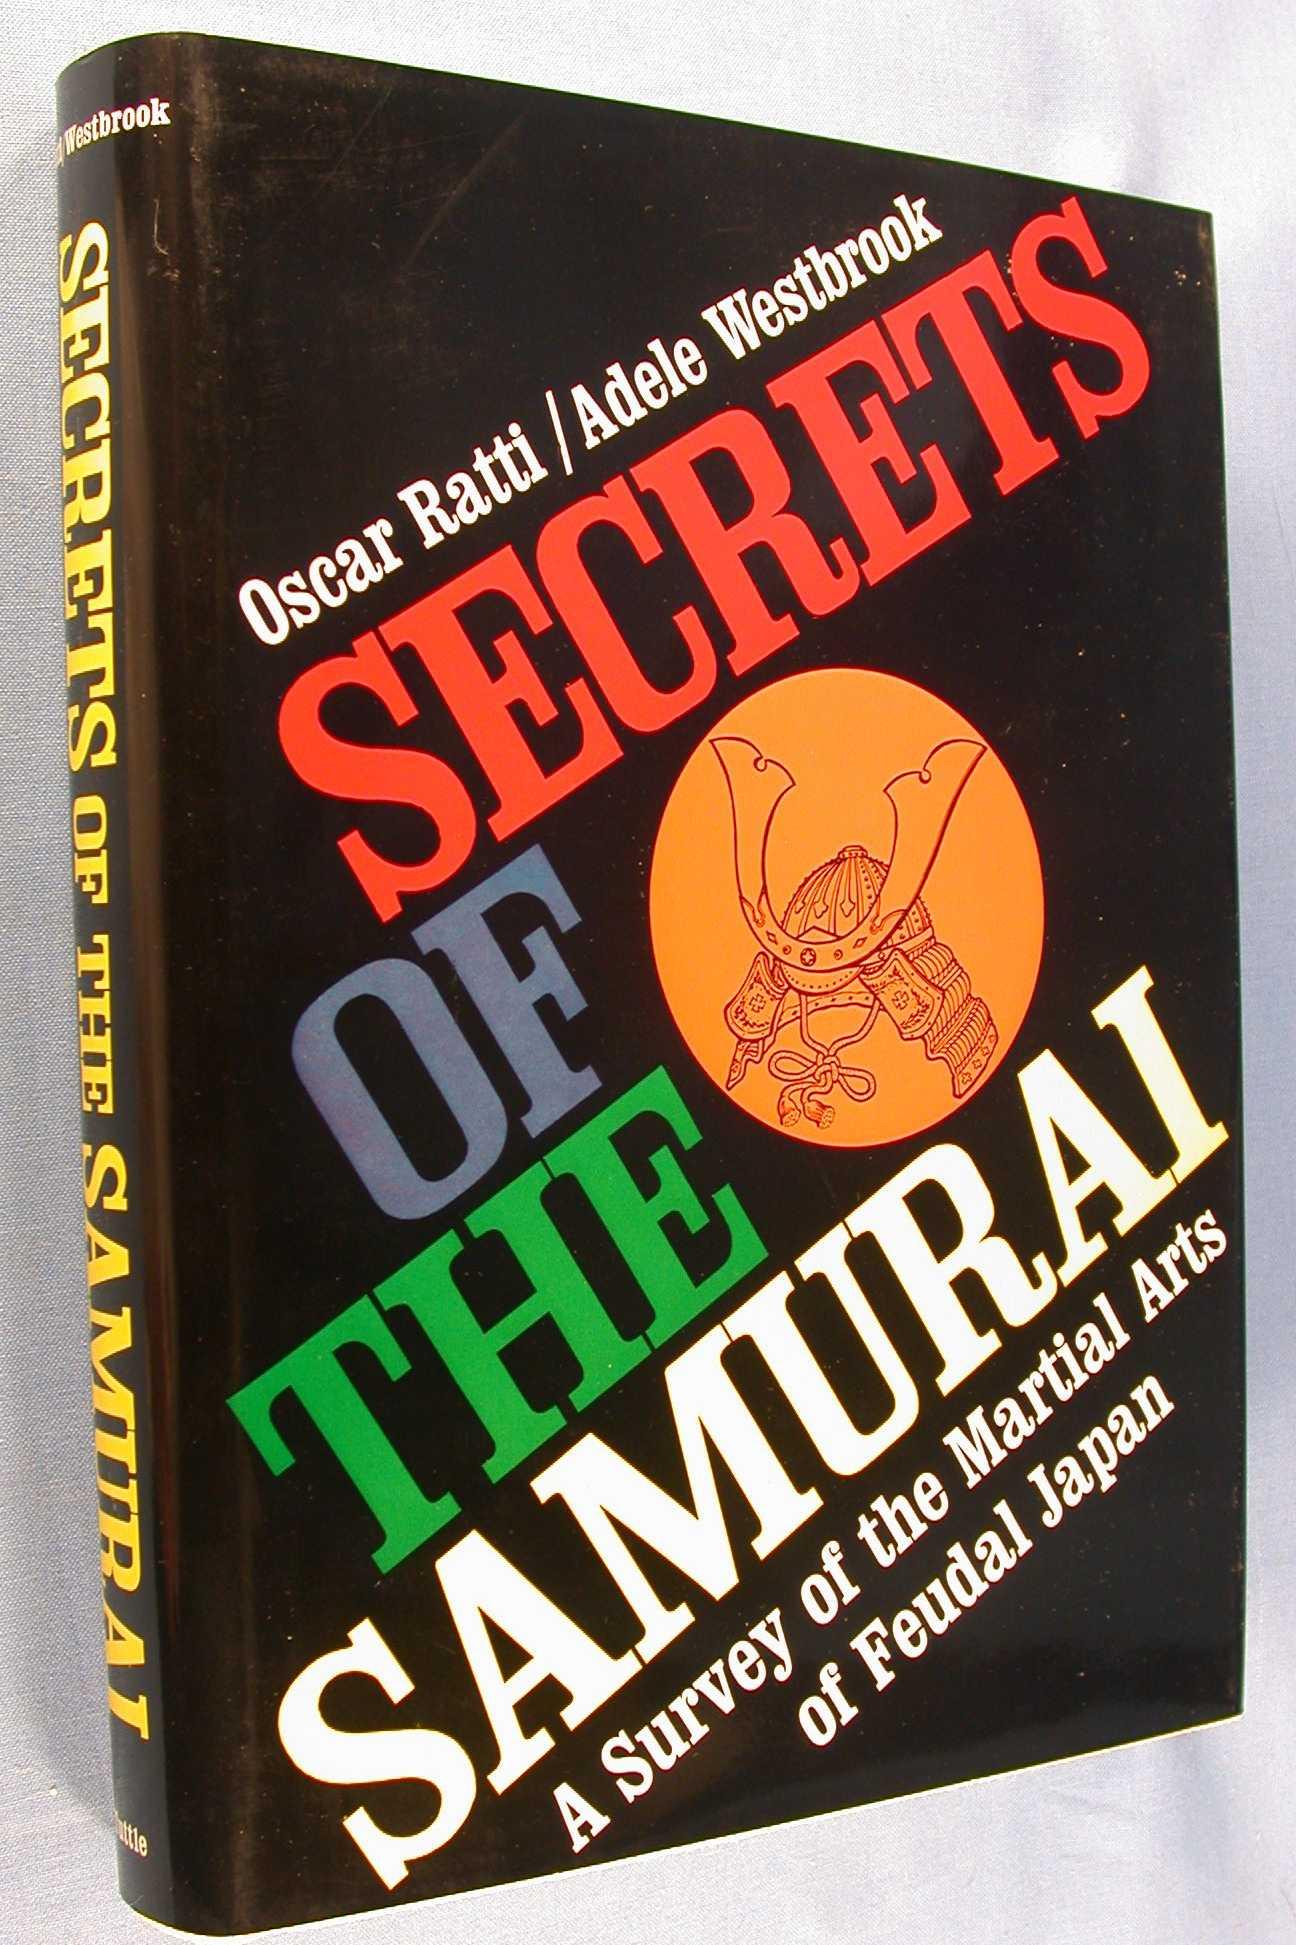 Secrets of the Samurai: A Survey of the Martial Arts in Feudal Japan, Ratti, Oscar; Adele Westbrook